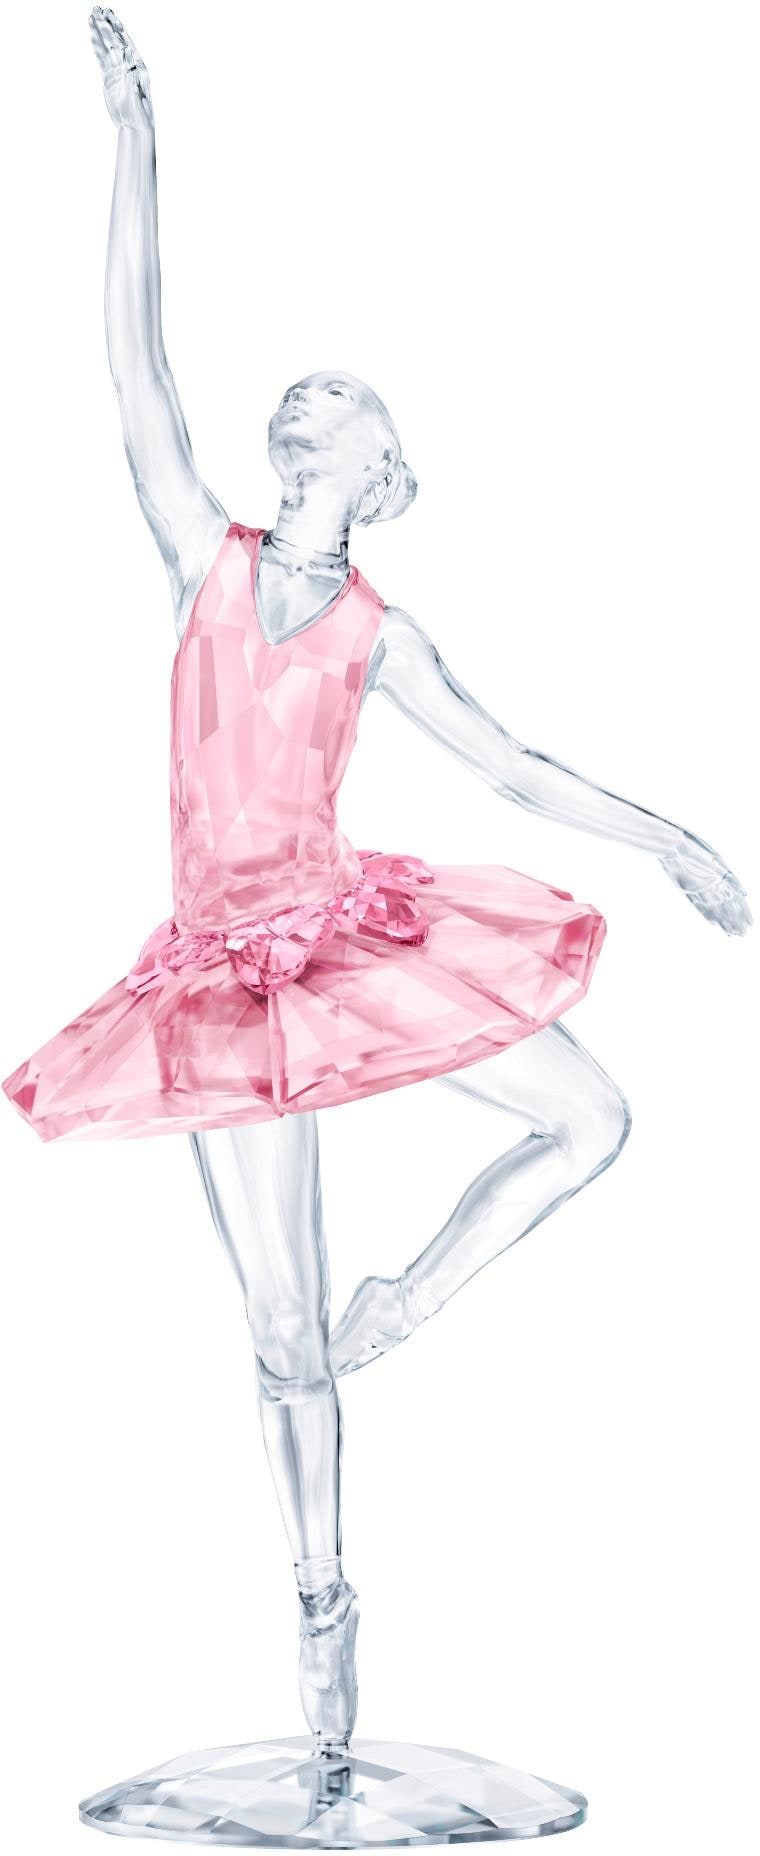 Swarovski Dekofigur Ballerina 5428650 (1 Stück) Preisvergleich